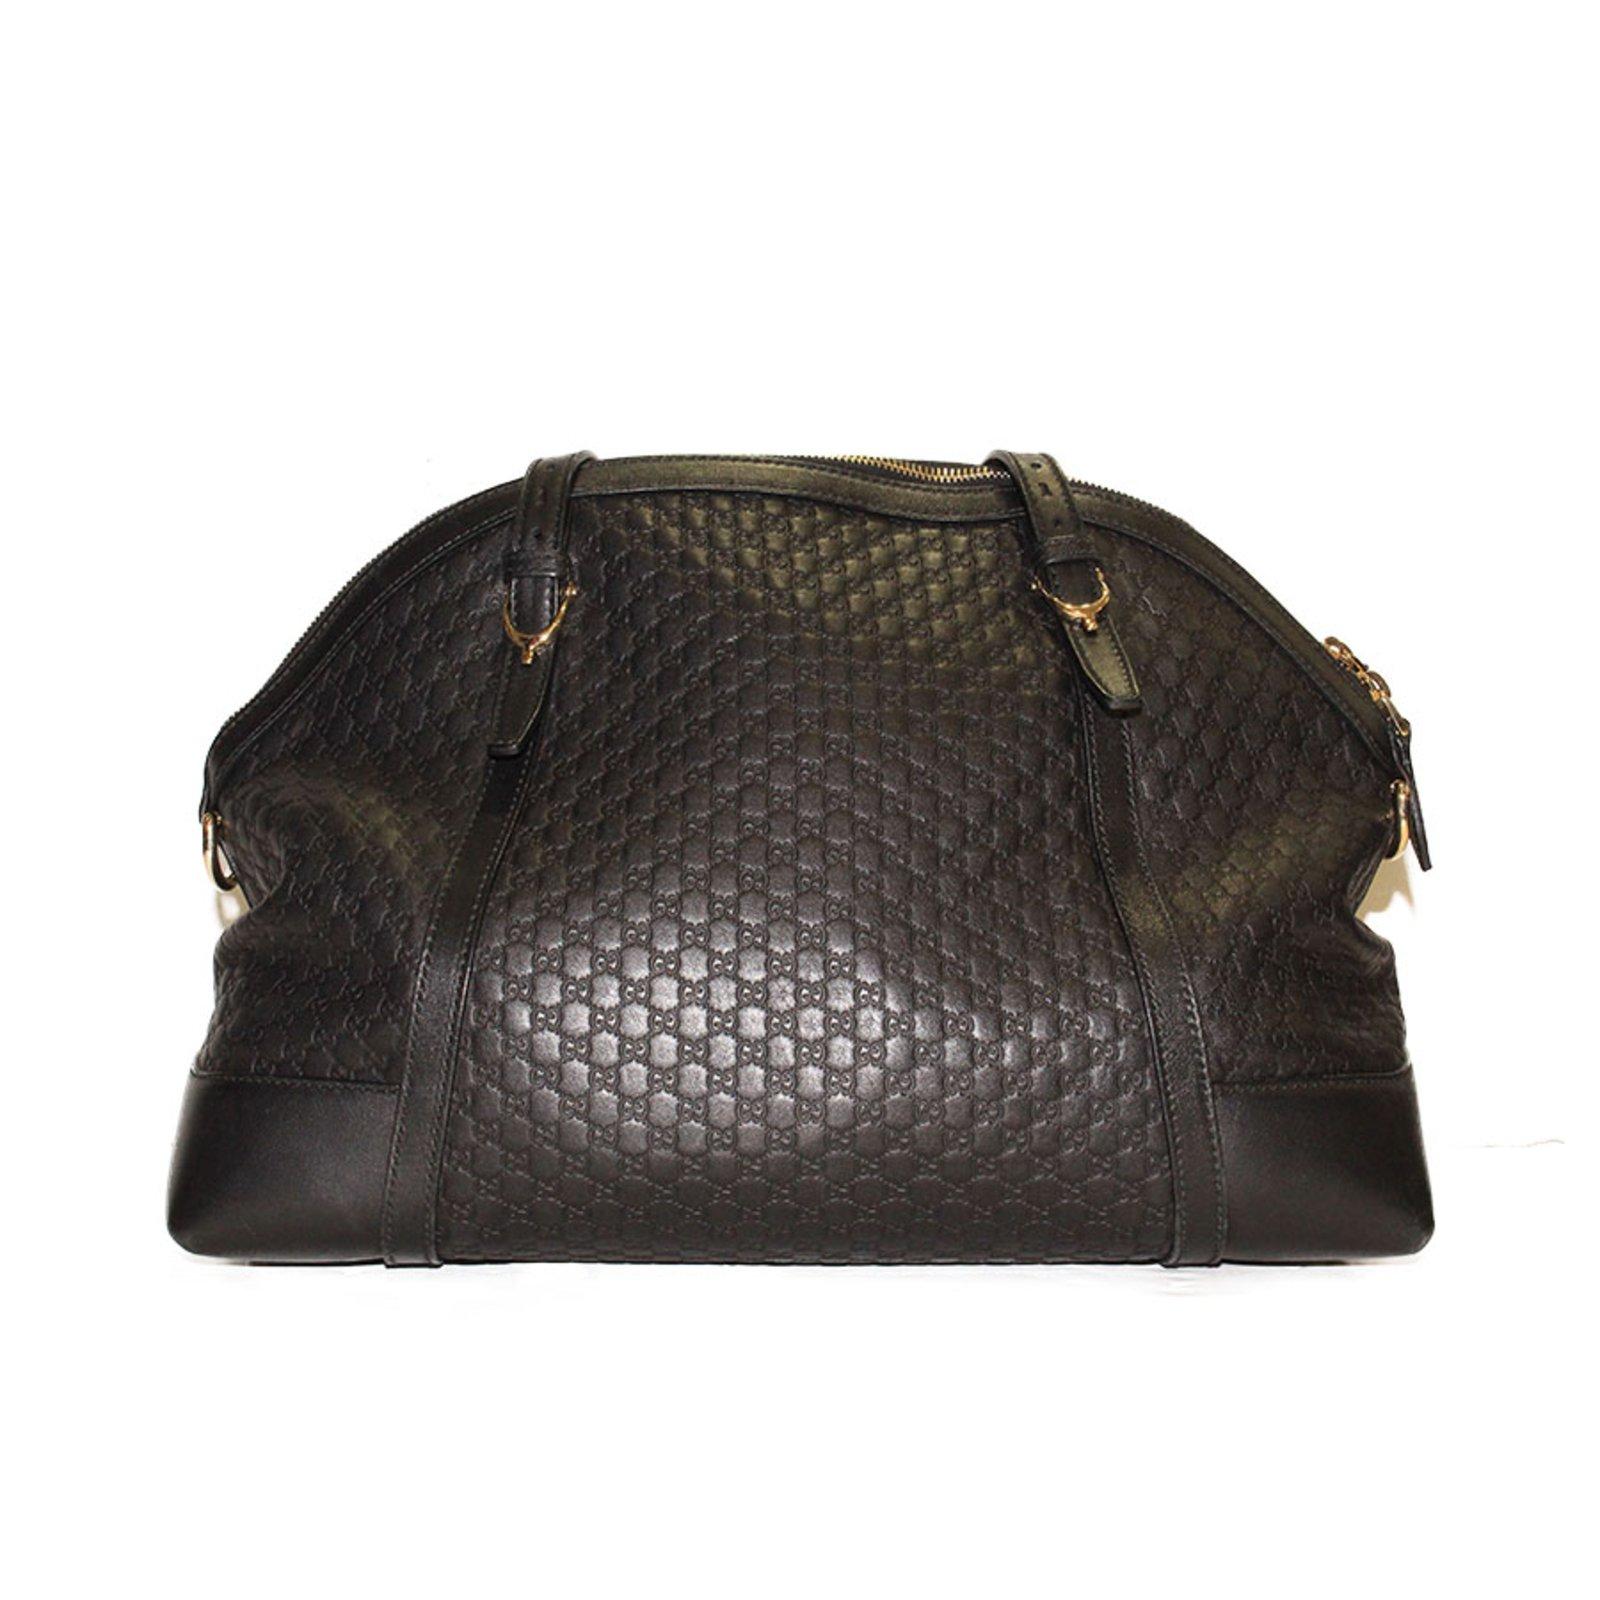 Cabas Gucci Sac gucci en cuir sigle gg noir avec bandouliere cuir d agneau  Noir ref.33098 - Joli Closet 5288bbc3b82